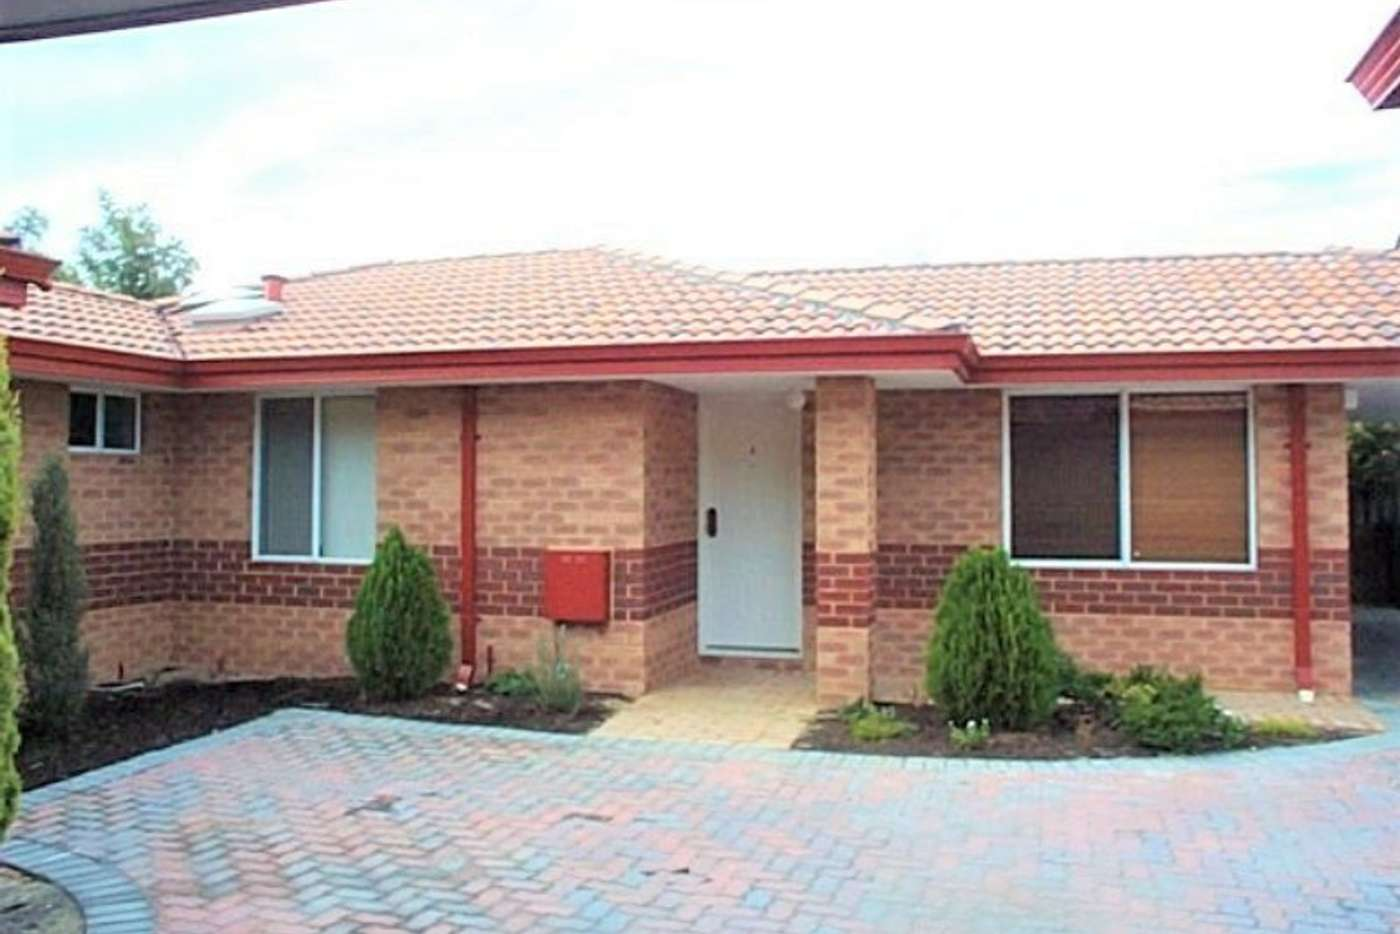 Main view of Homely villa listing, 5/38 Woodloes Street, Cannington WA 6107